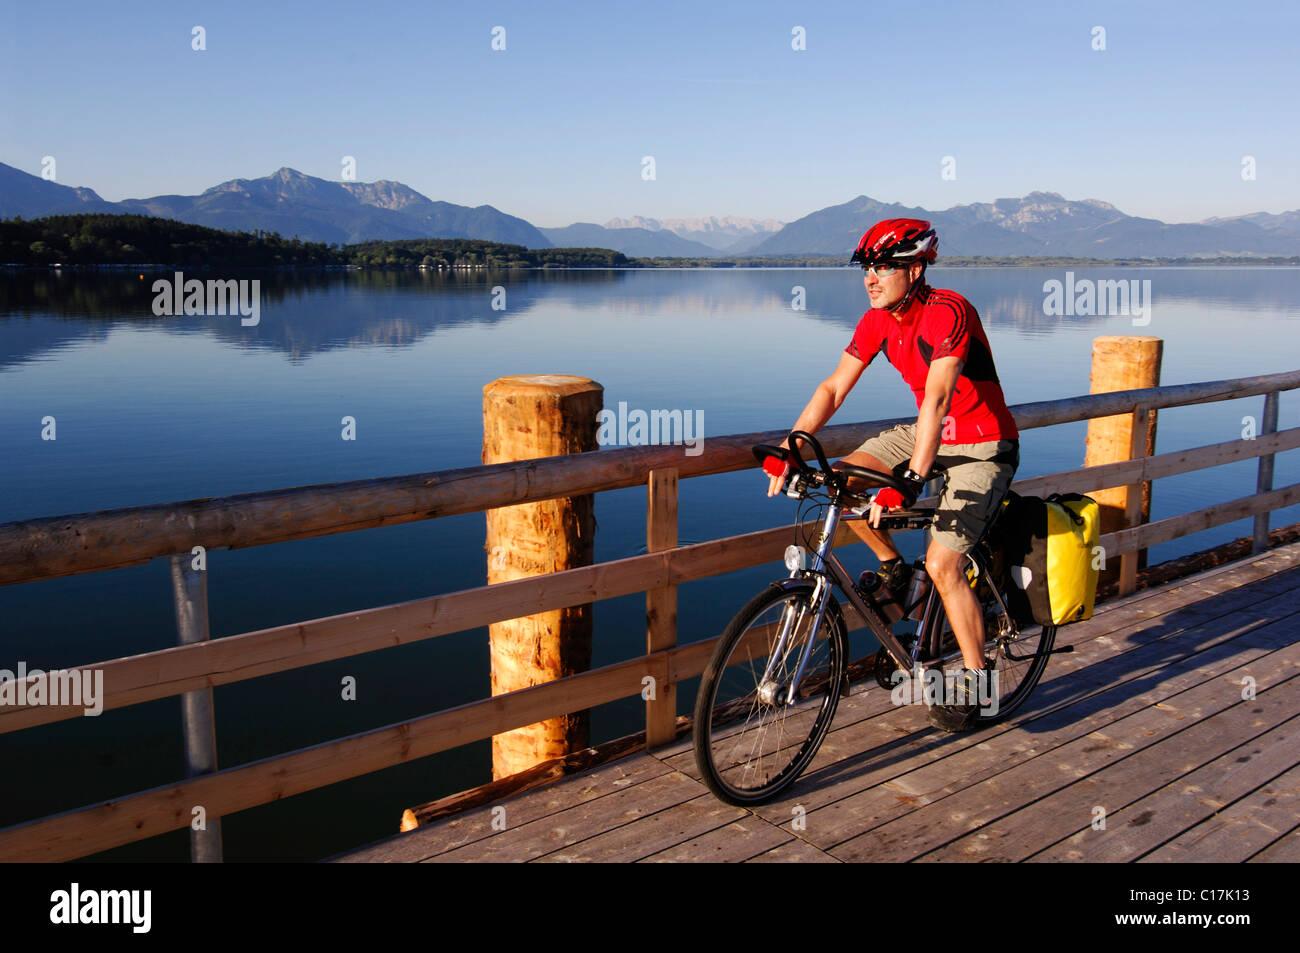 Bicyclist at Dampfersteg in Chieming, Chiemsee, lake, Chiemgau, Bavaria, Germany, Europe - Stock Image